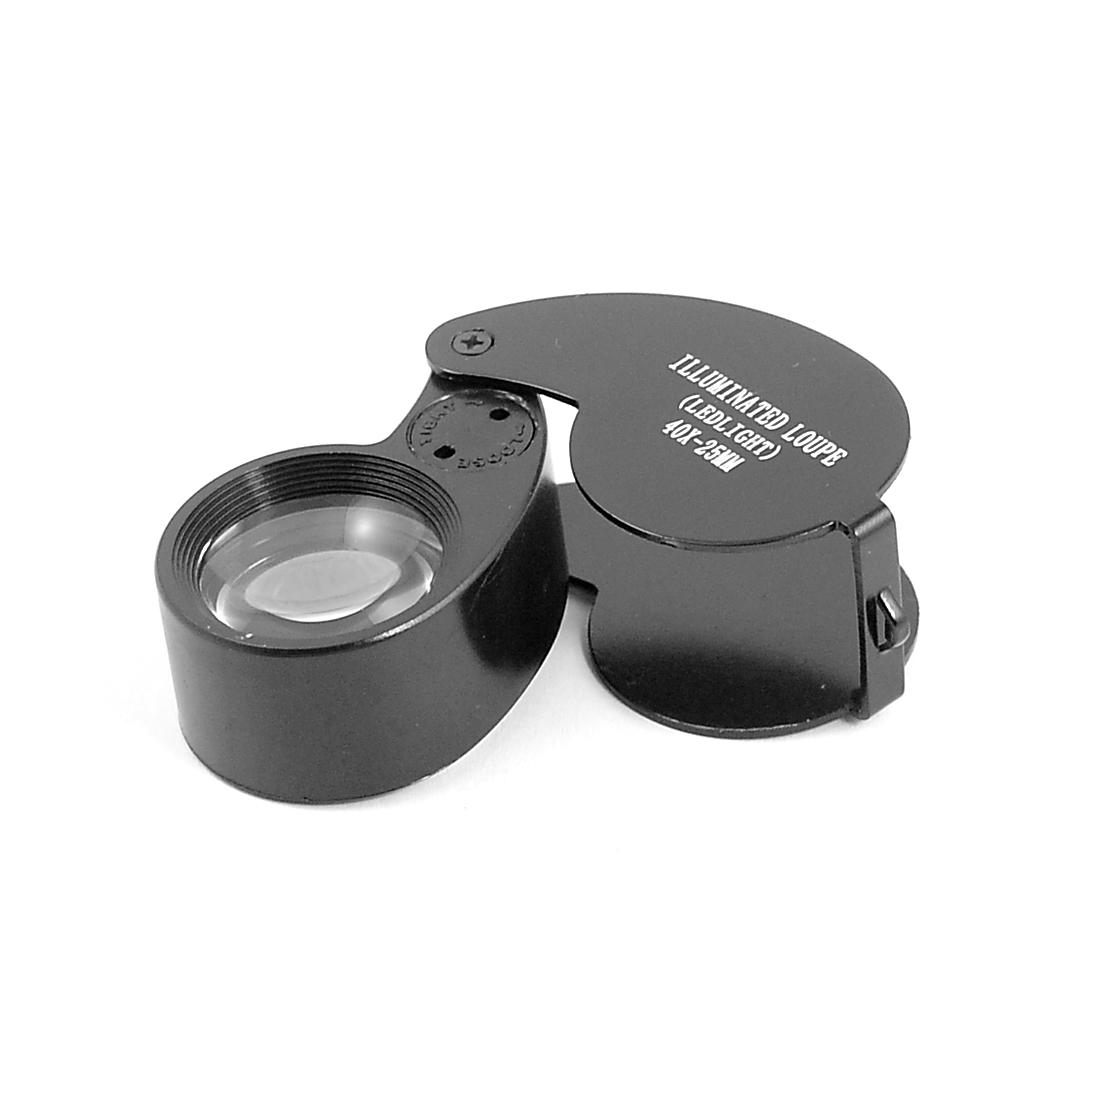 Pocket Magnifying Jewelry Eye Loupe 2 LED Light 4X Magnifier Black